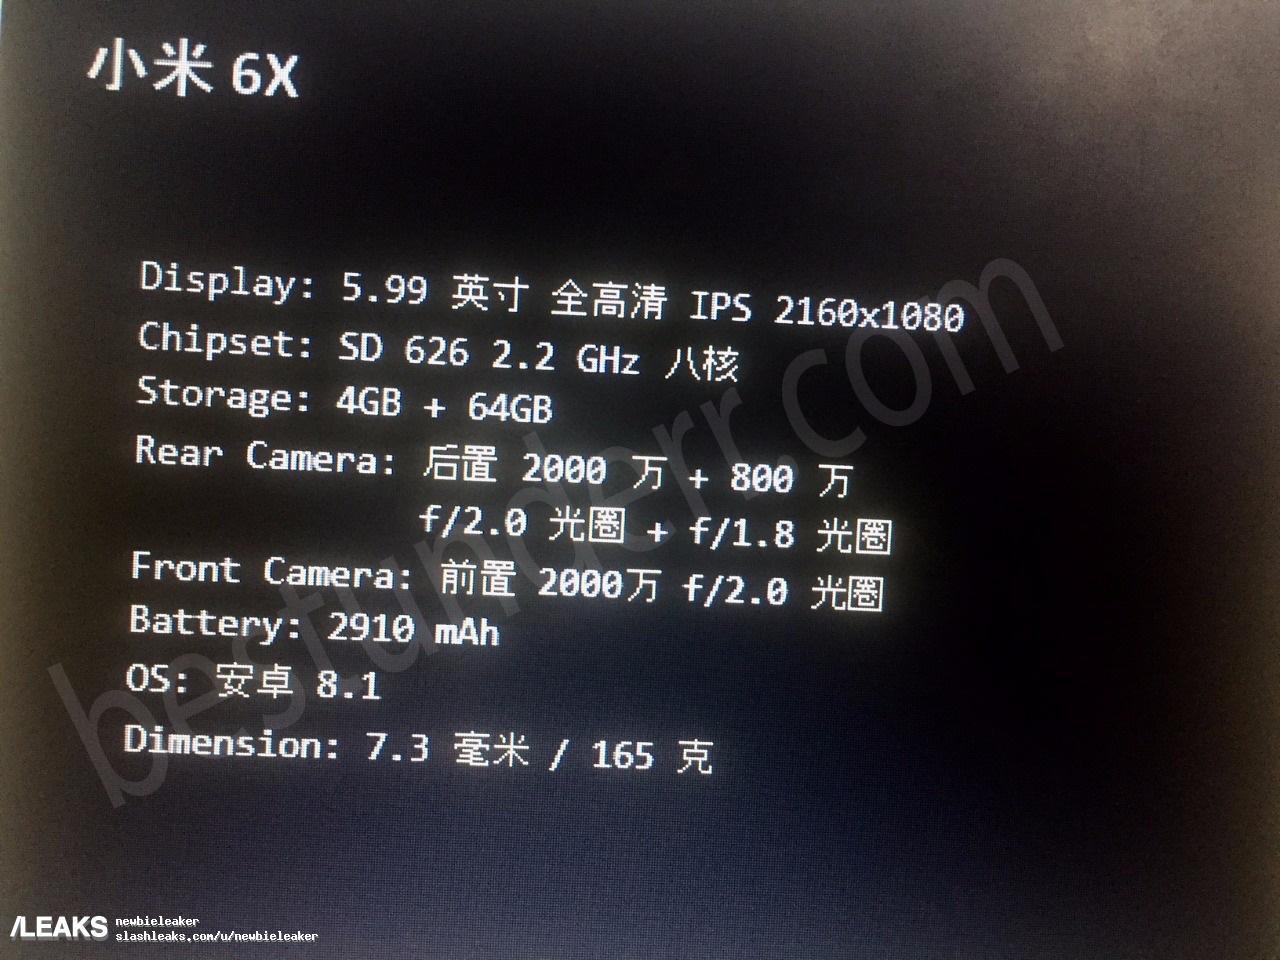 img Mi 6X/A2 Spec Sheet Confirms Snapdragon 626 and Dual Cameras